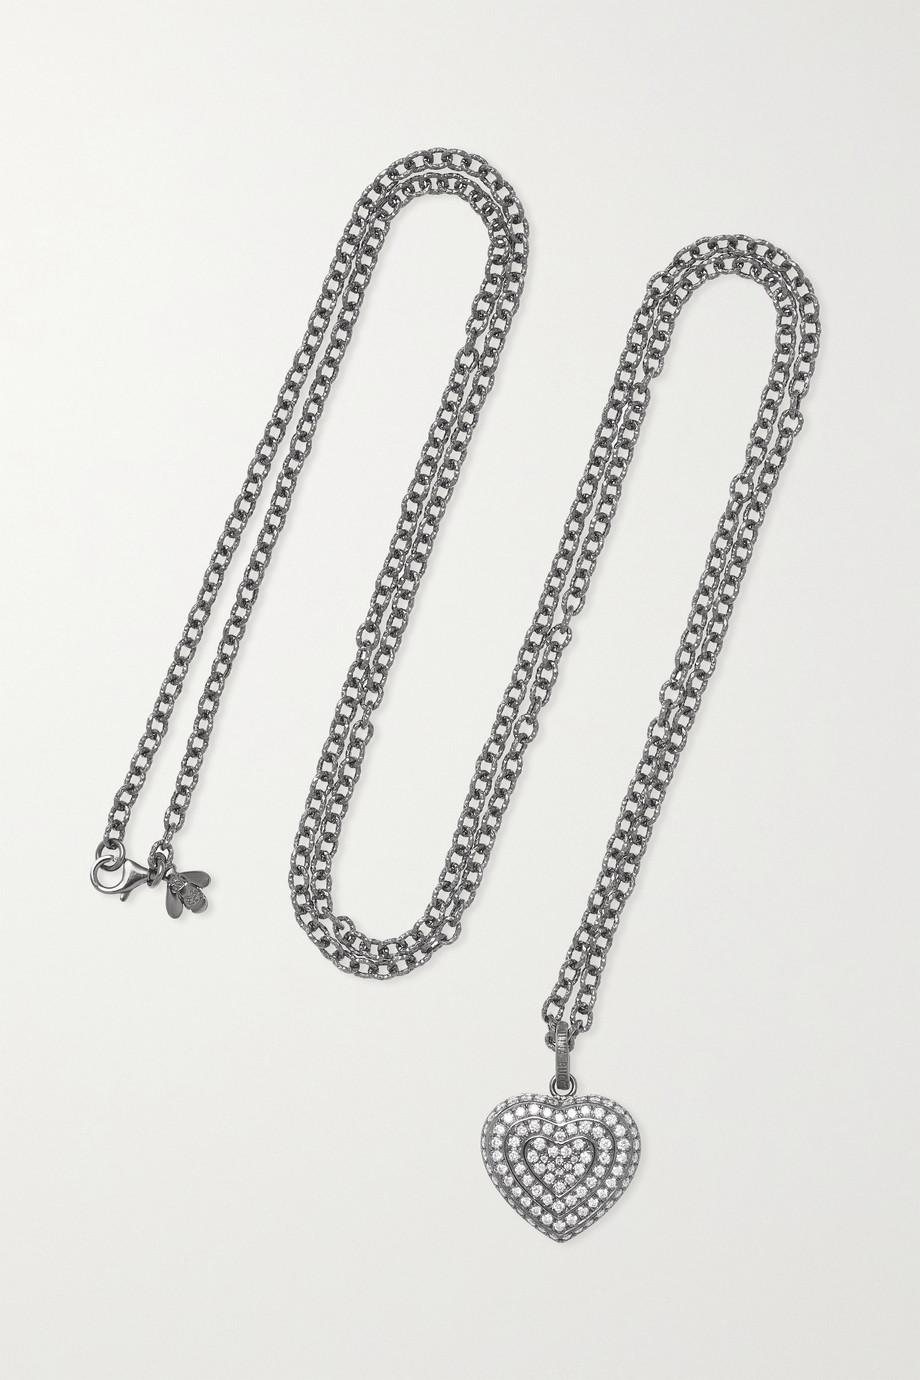 Carolina Bucci 18-karat blackened gold diamond necklace